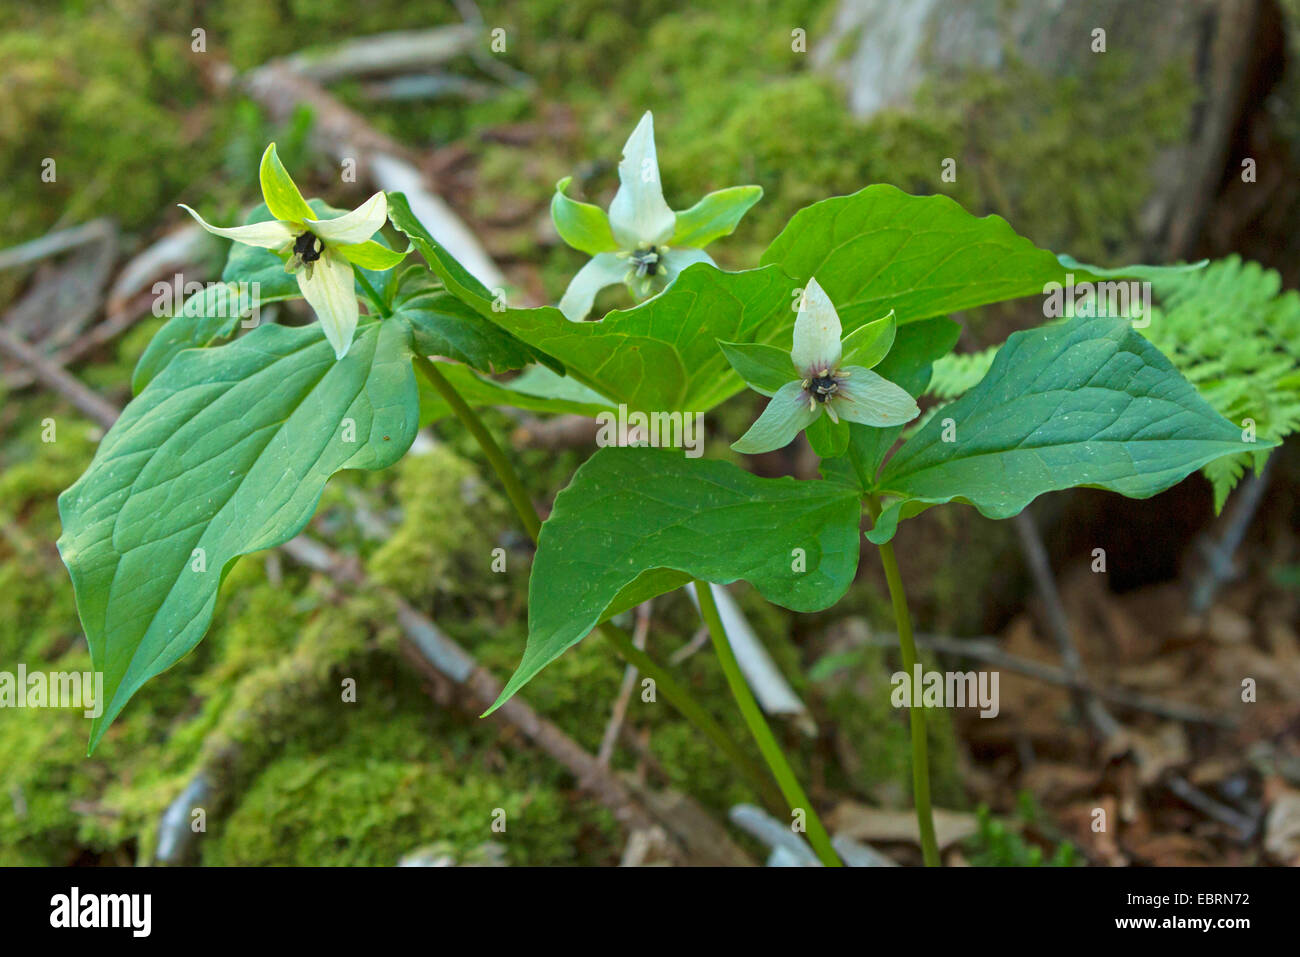 stinking-benjamin, ill-scent trillium (Trillium erectum), blooming, USA, Tennessee, Great Smoky Mountains National - Stock Image